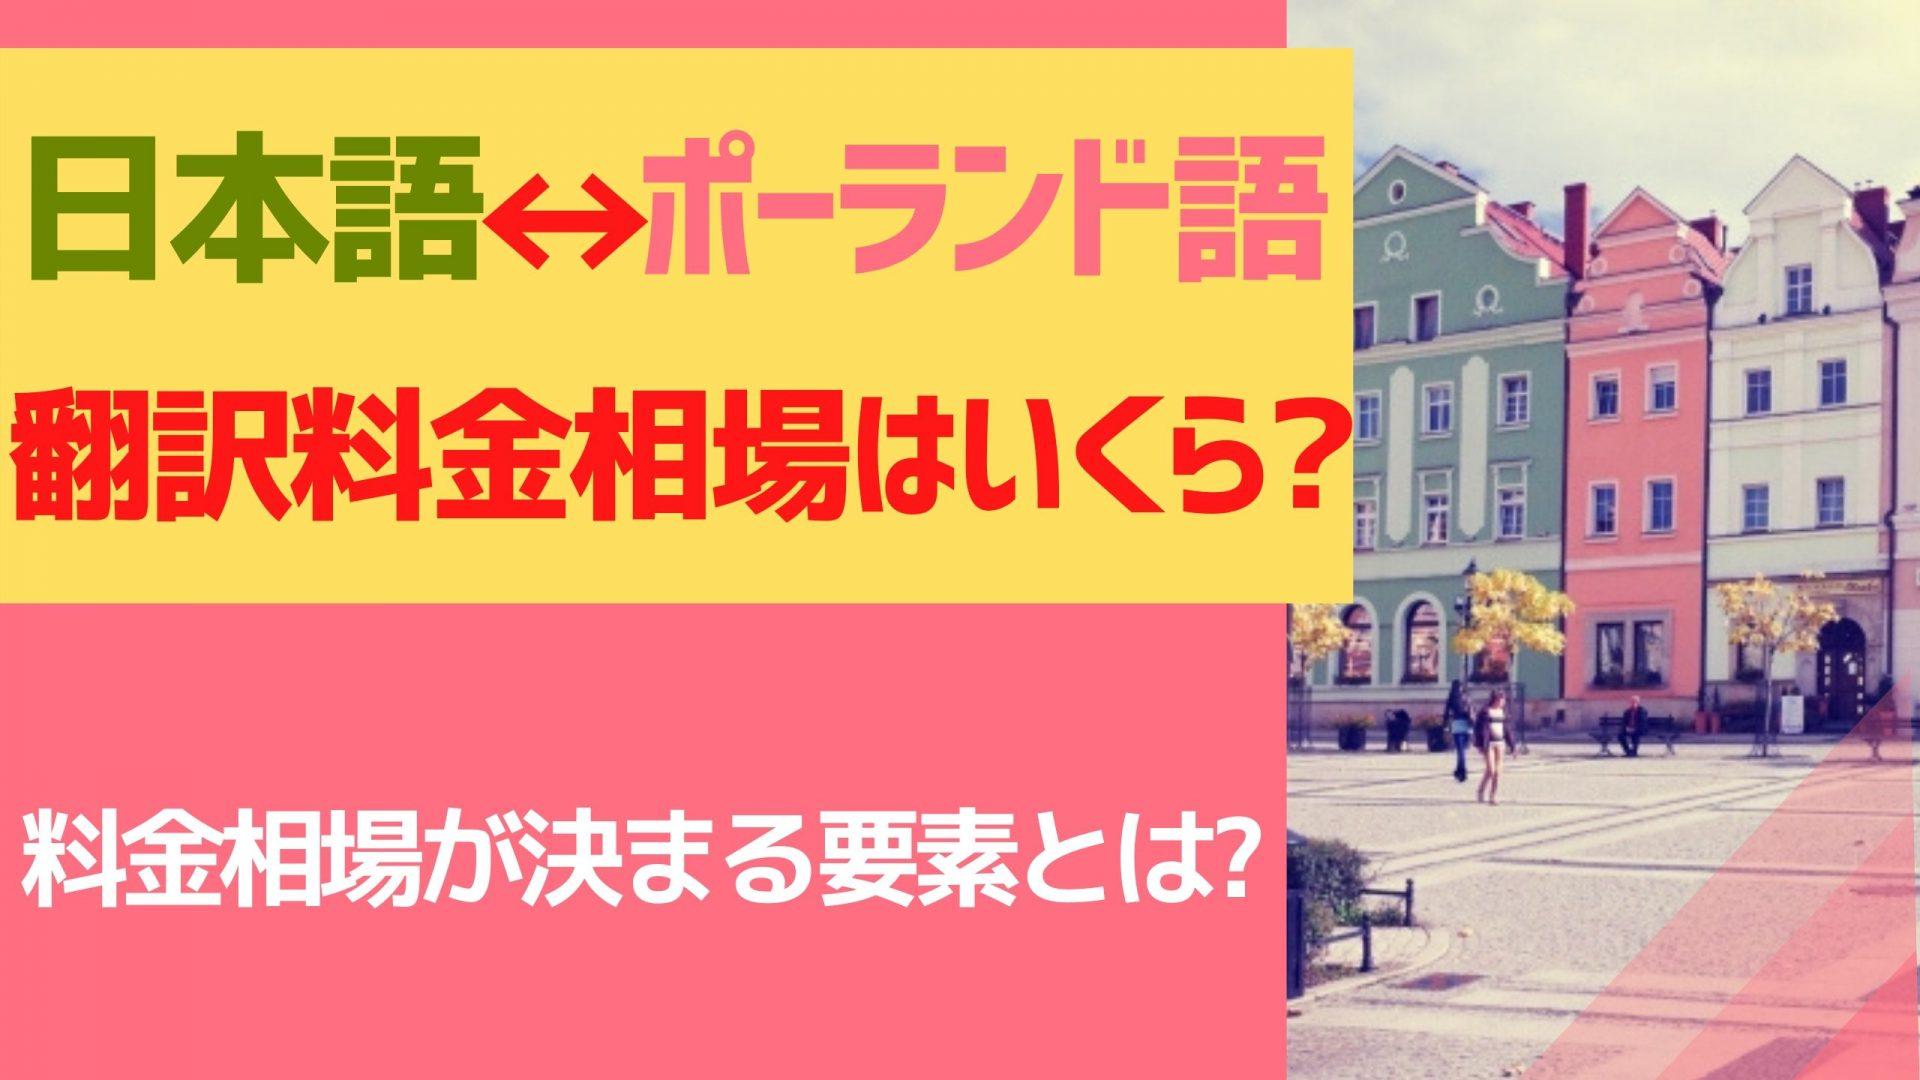 01624b2ca9adaa14a79743189c3486bb - 日本語・ポーランド語間の翻訳の料金相場・単価はいくら?